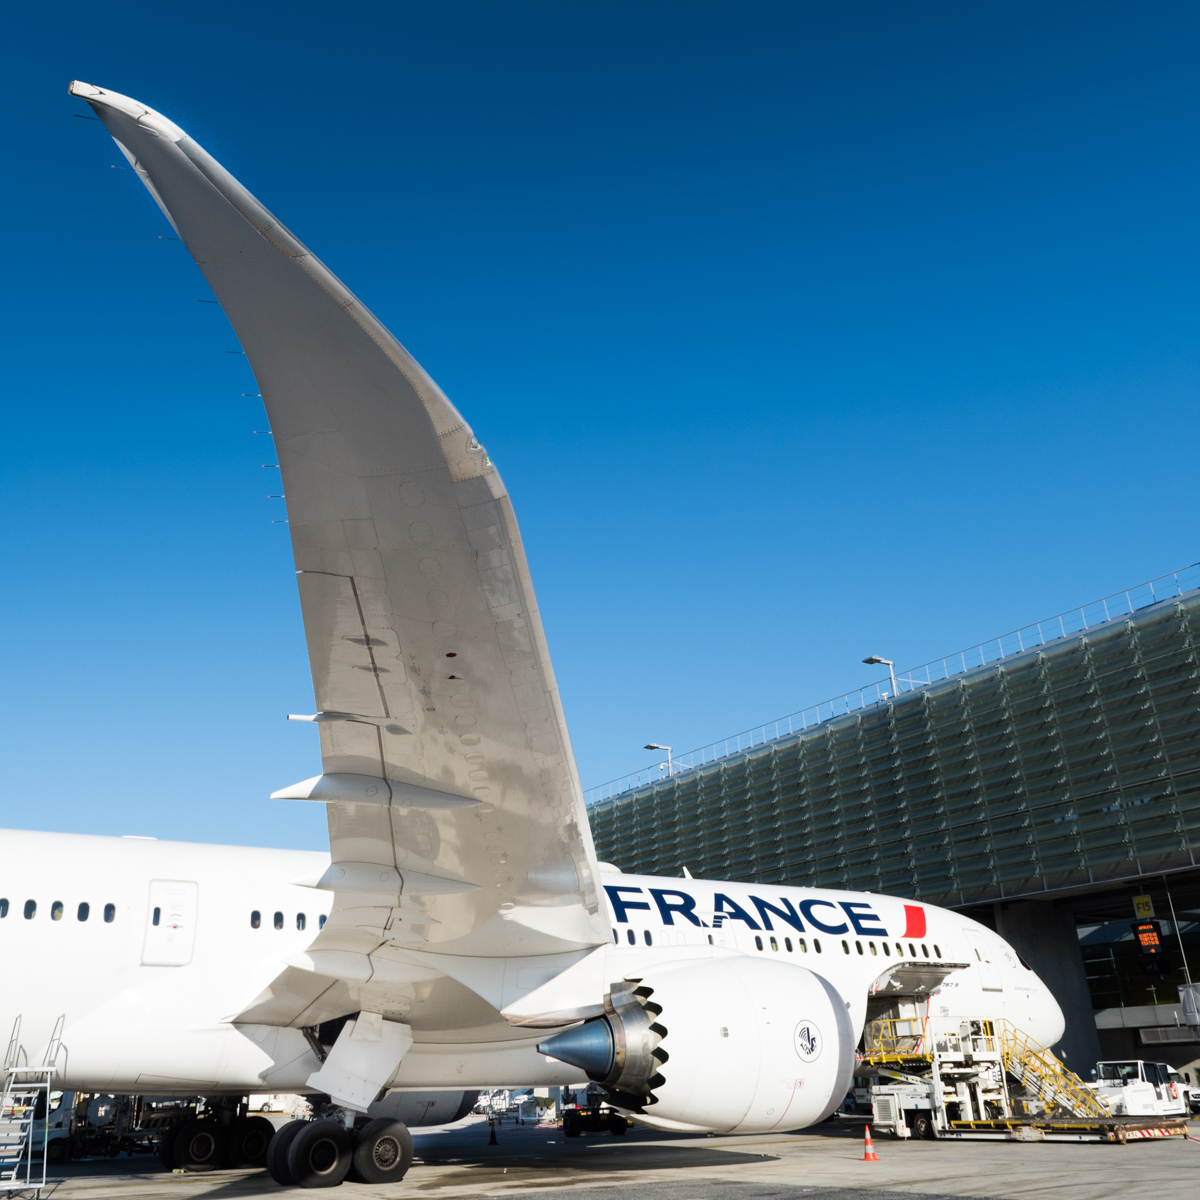 france 787 wing (1 of 1).jpg